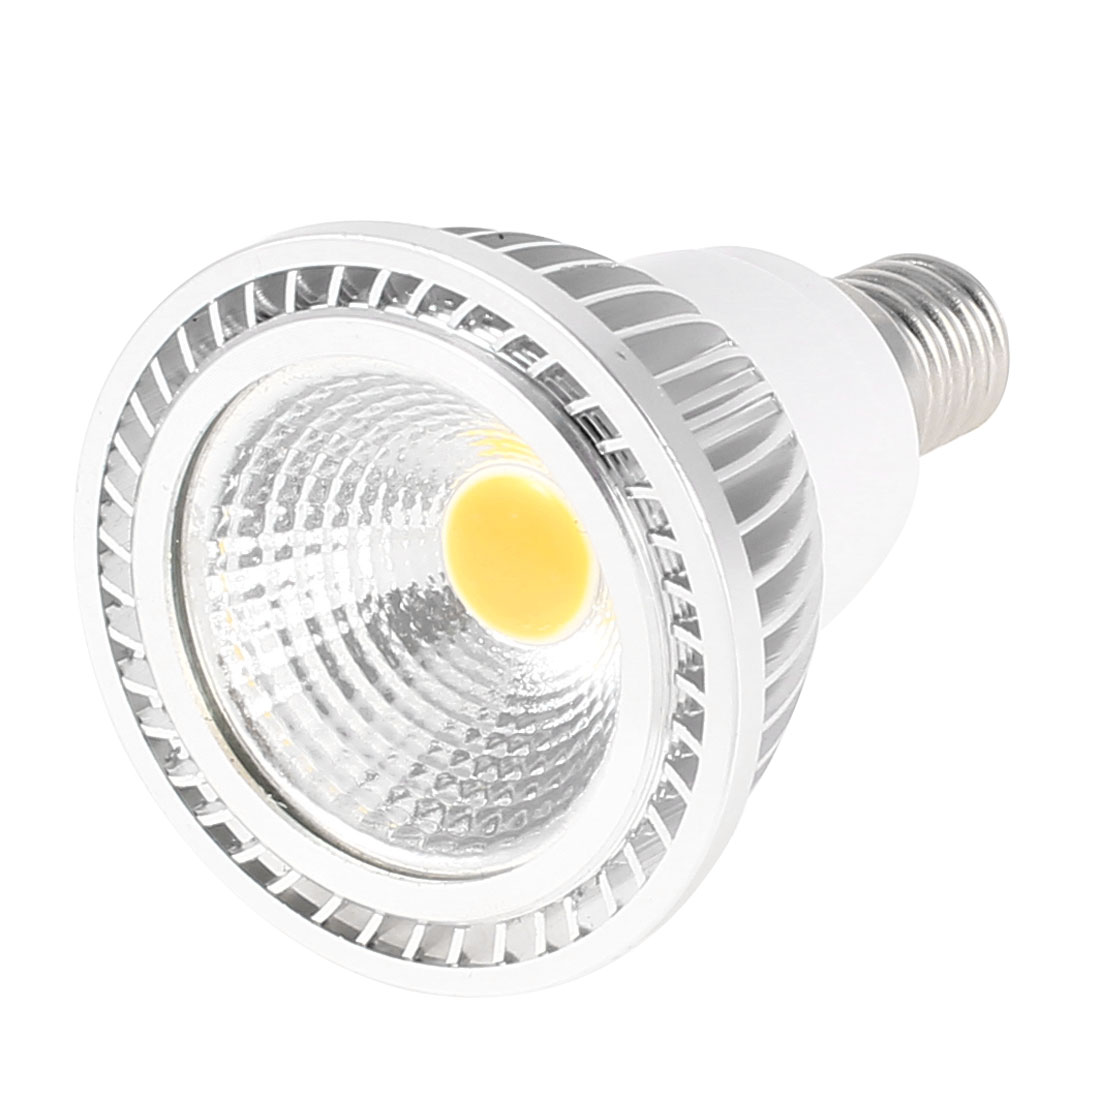 AC 85-265V E14 Base 3W Power Warm White LED Light Ceiling COB Spotlight Lamp Bulb